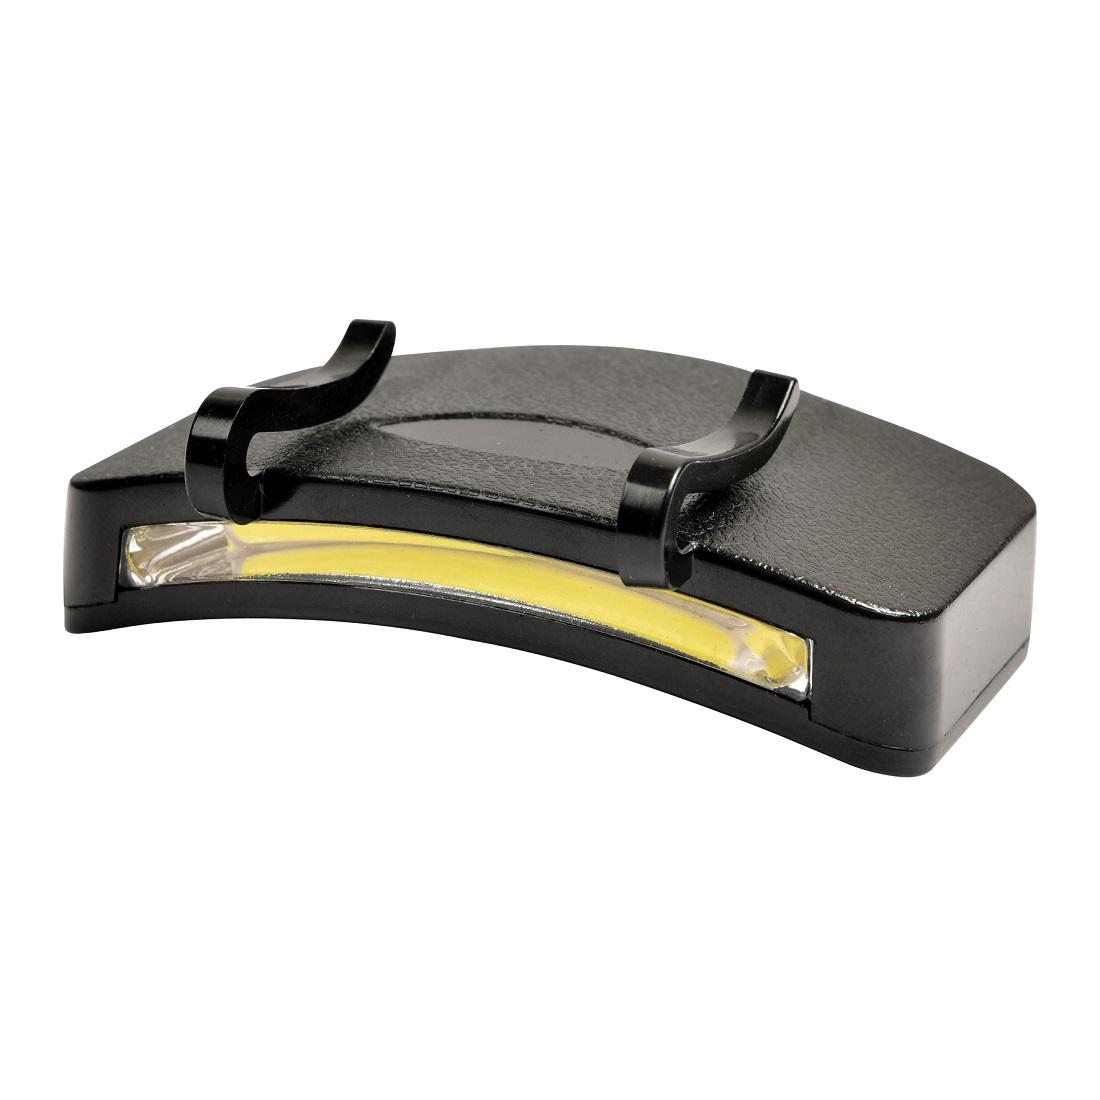 Heitech COB-LED Caplight Kopflampe für Caps inkl. 3 Micro/AAA Batterien